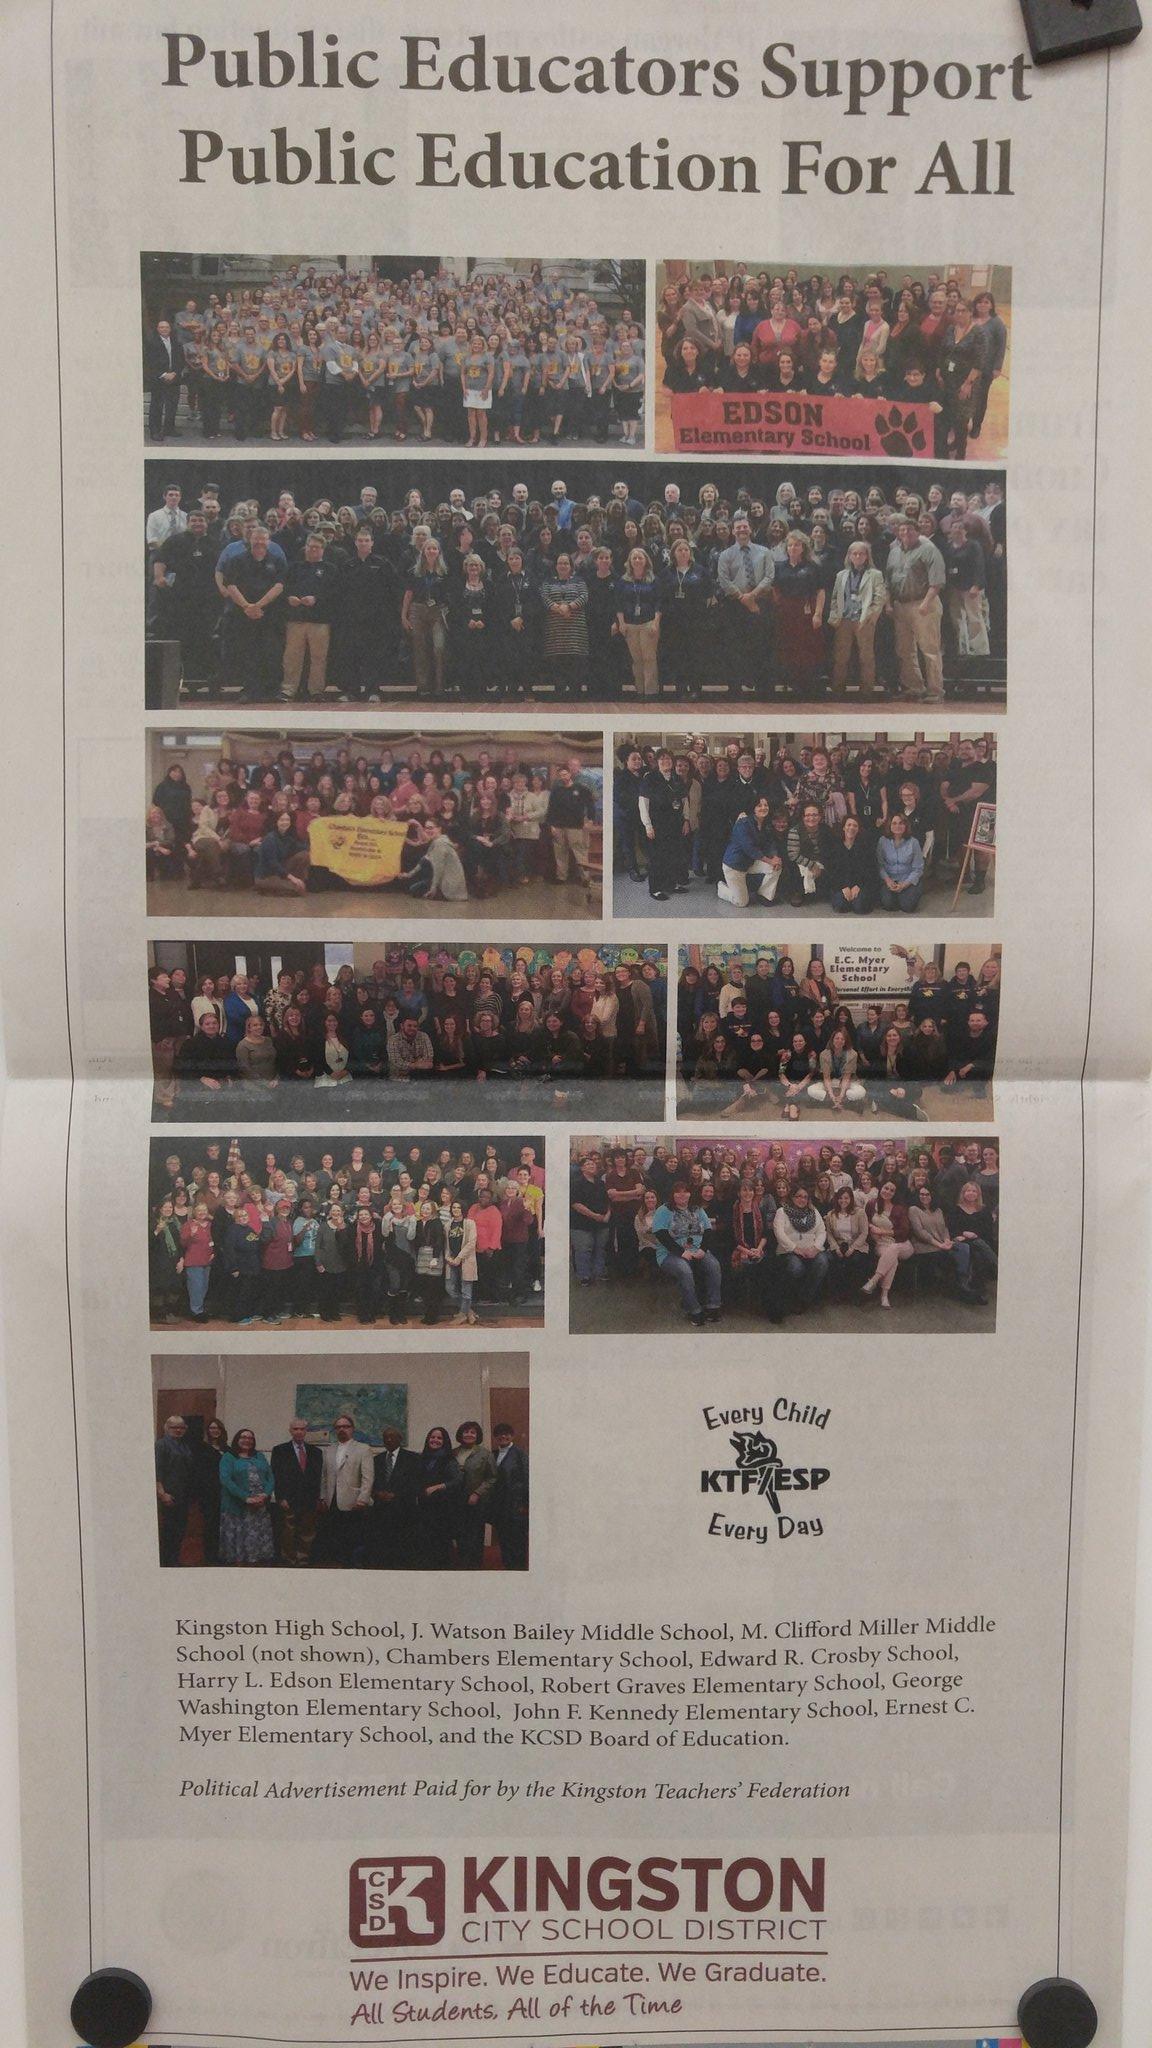 Kingston Teachers' Federation #ReclaimOurSchools https://t.co/UG63twBMsF